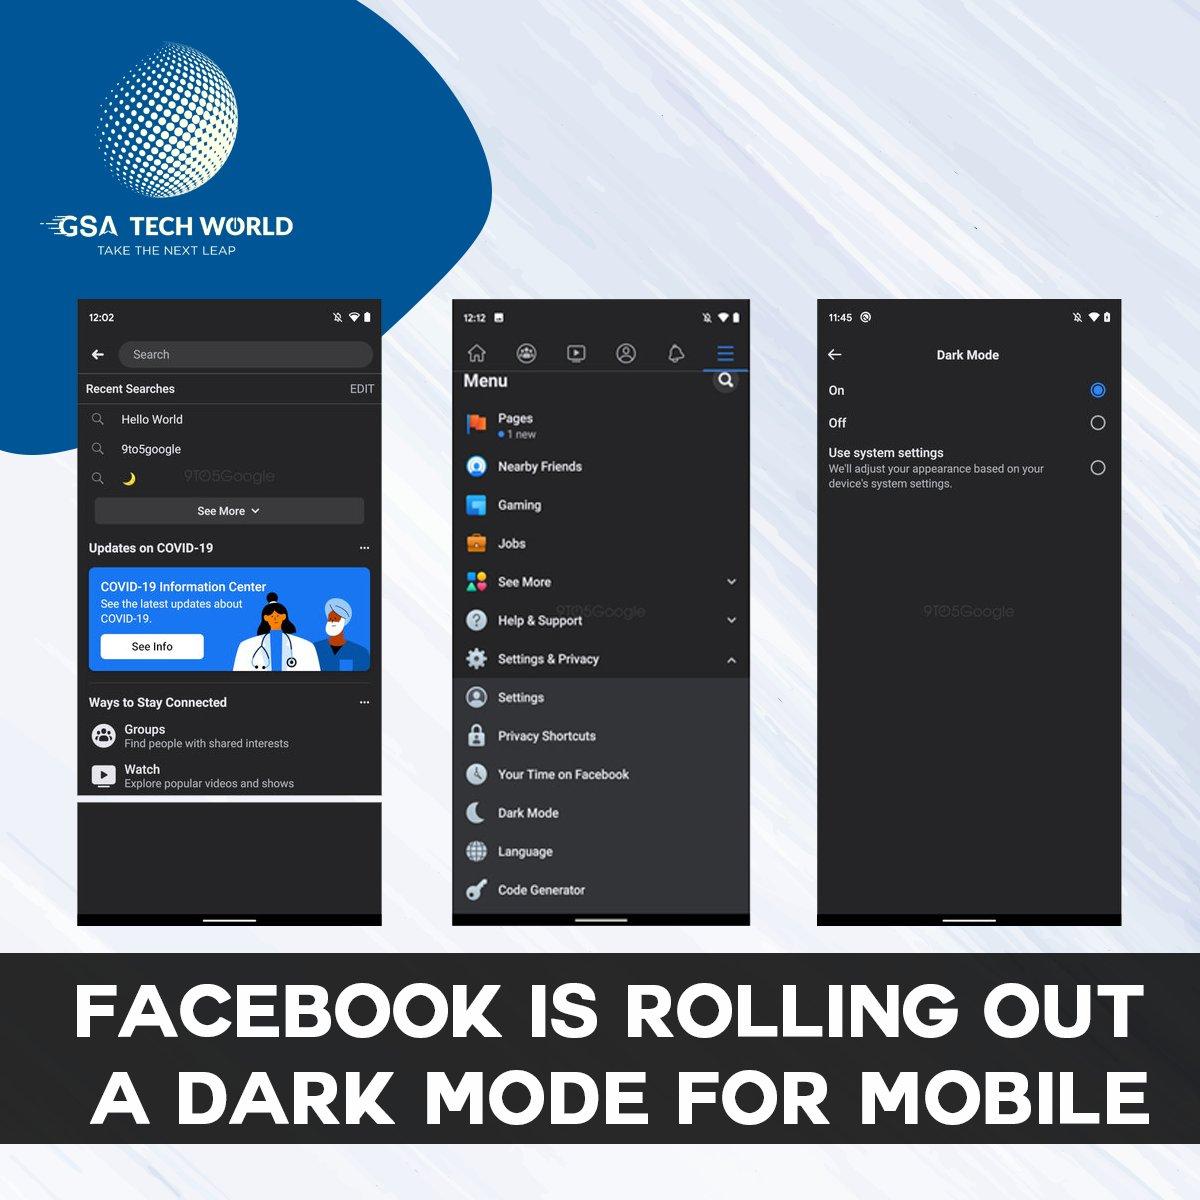 Facebook is Rolling Out A Dark Mode For Mobile  Read More:  https:// bit.ly/38vyRhh      #facebook #facebookapp #facebookredesign #gsatechworld #webdevlopement #webdeveloper #iosdeveloper #androiddeveloper #iosdevelopment #androiddevelopment <br>http://pic.twitter.com/O8HHyJd8T0